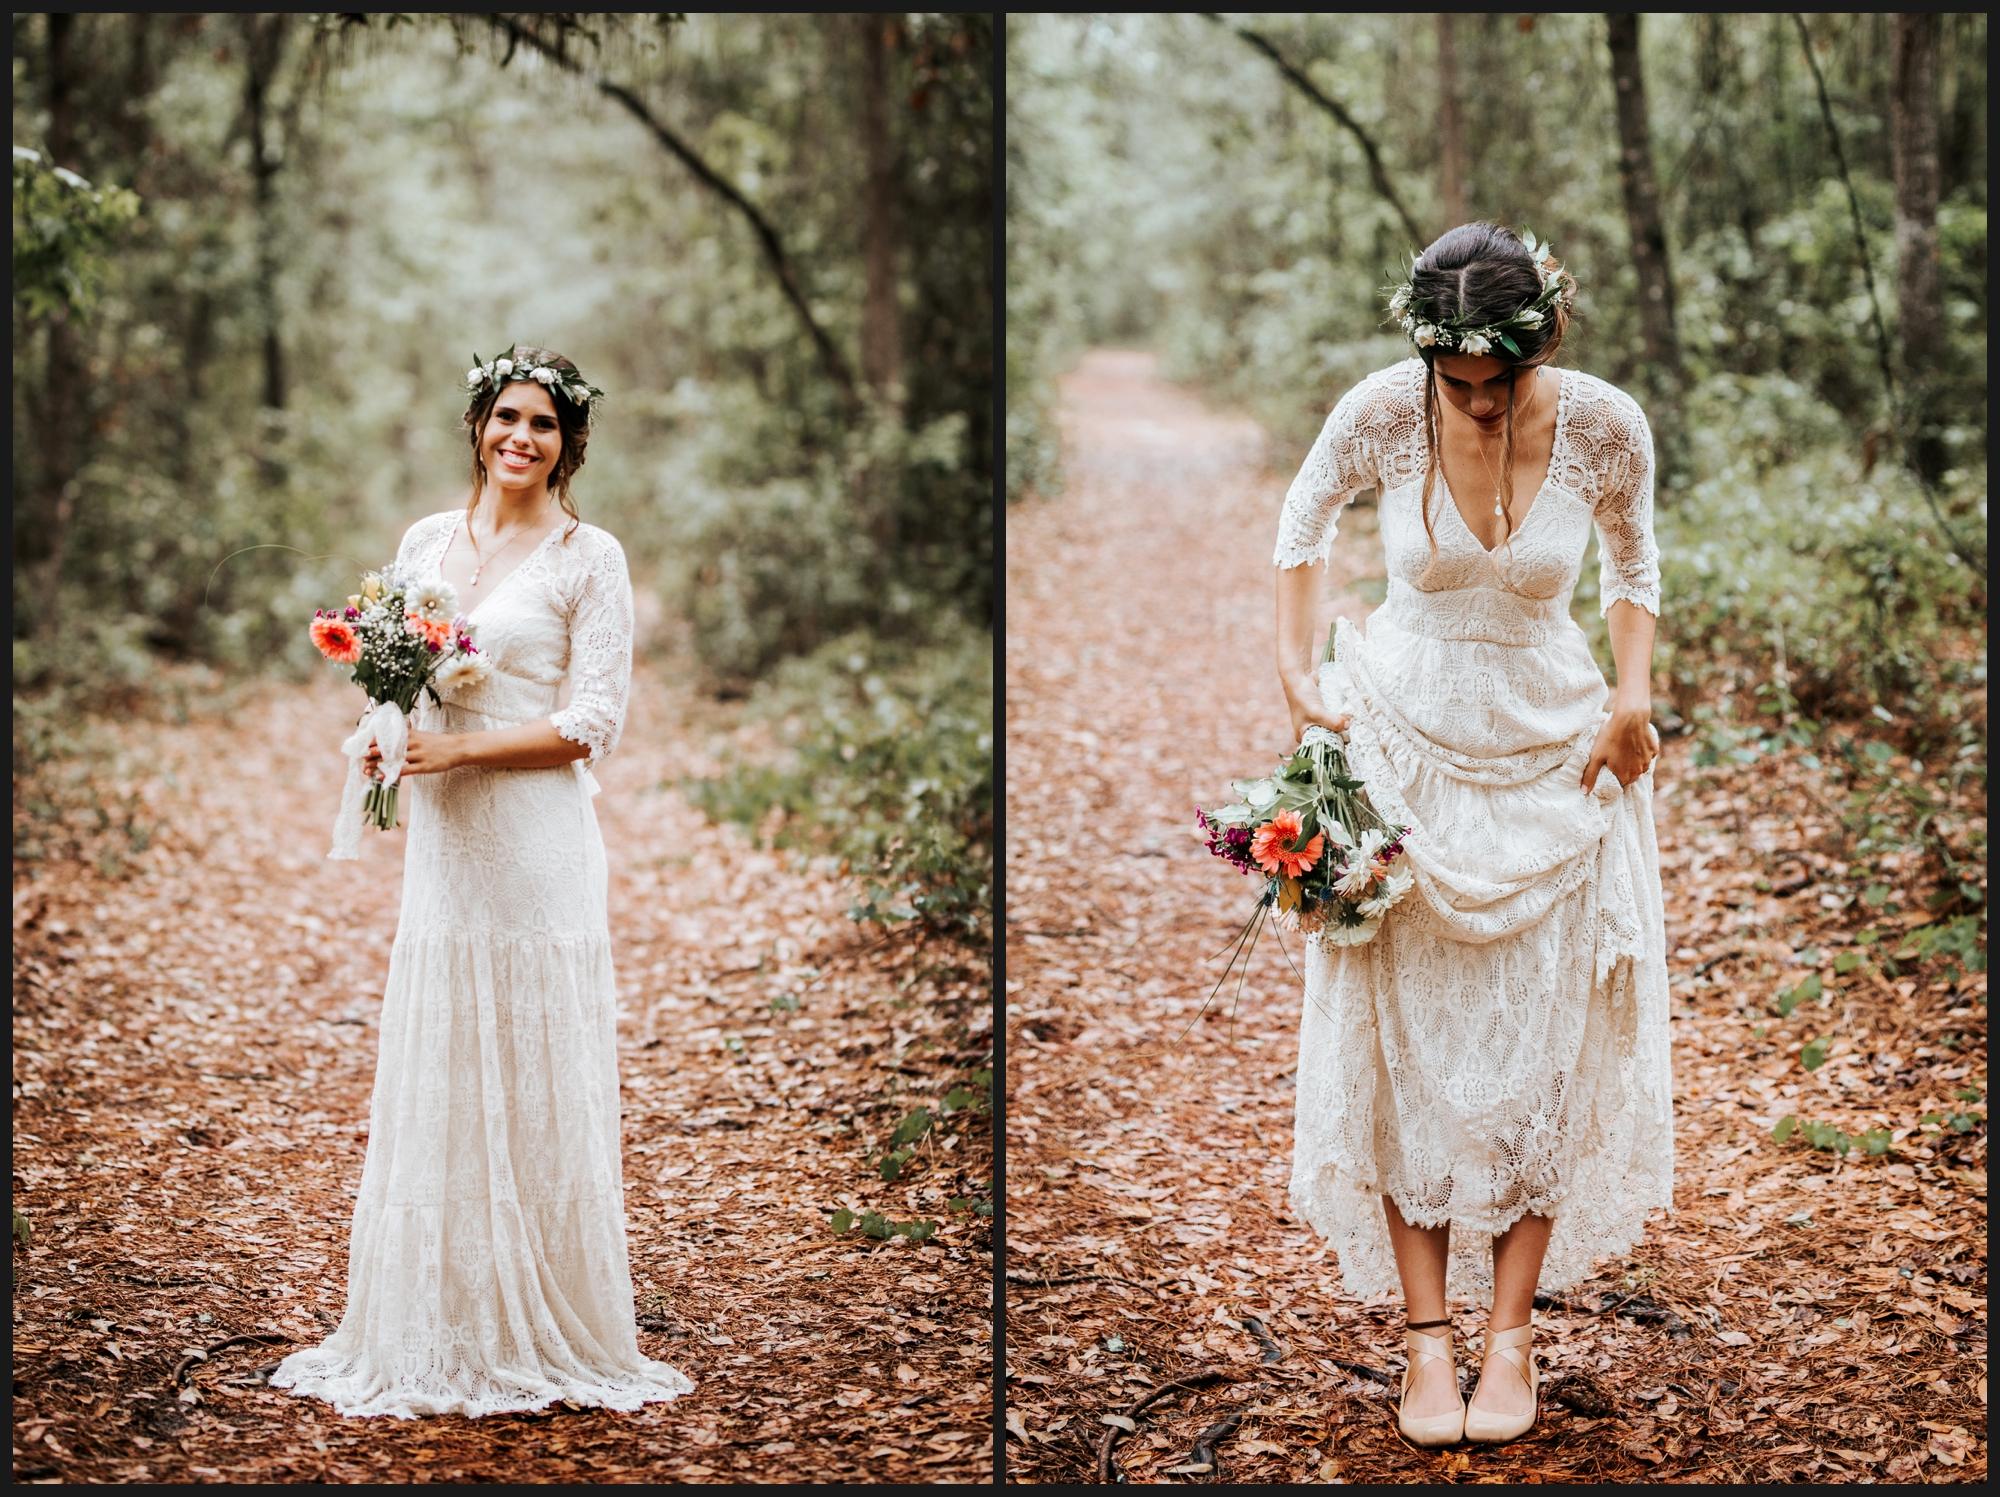 Orlando-Wedding-Photographer_0018.jpg